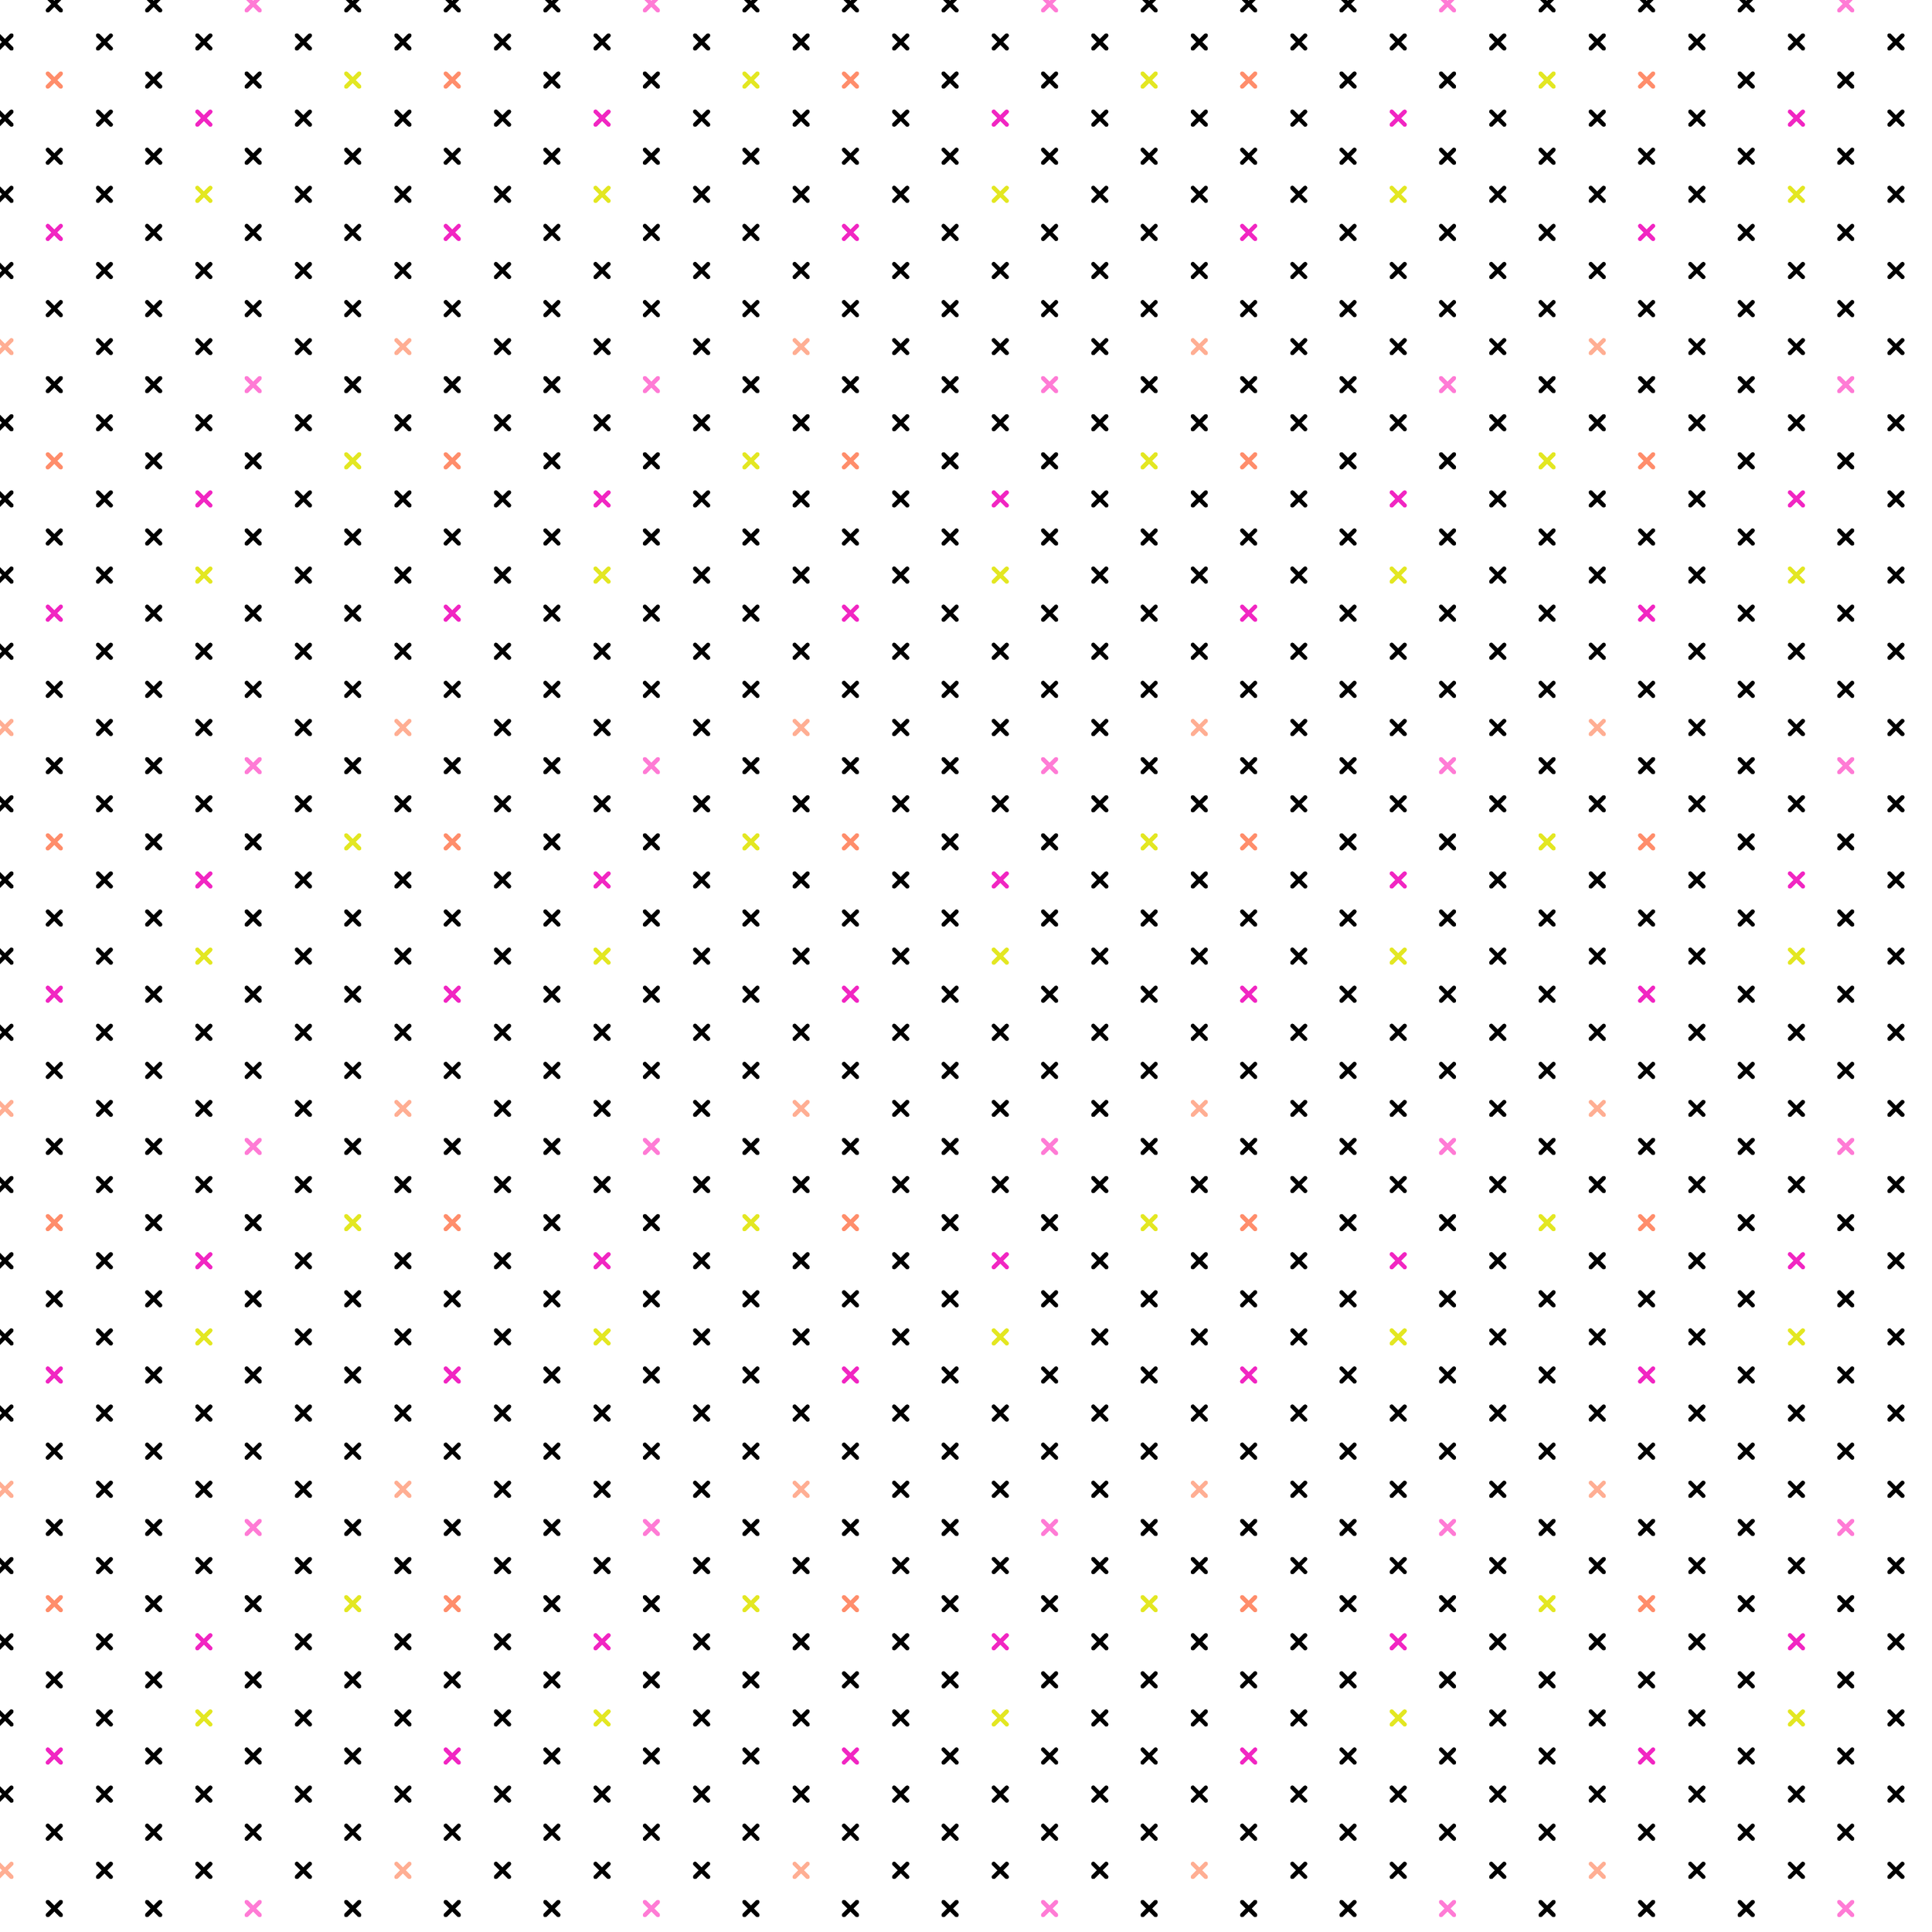 Geometric Patterns_Crosses_300 dpi.png